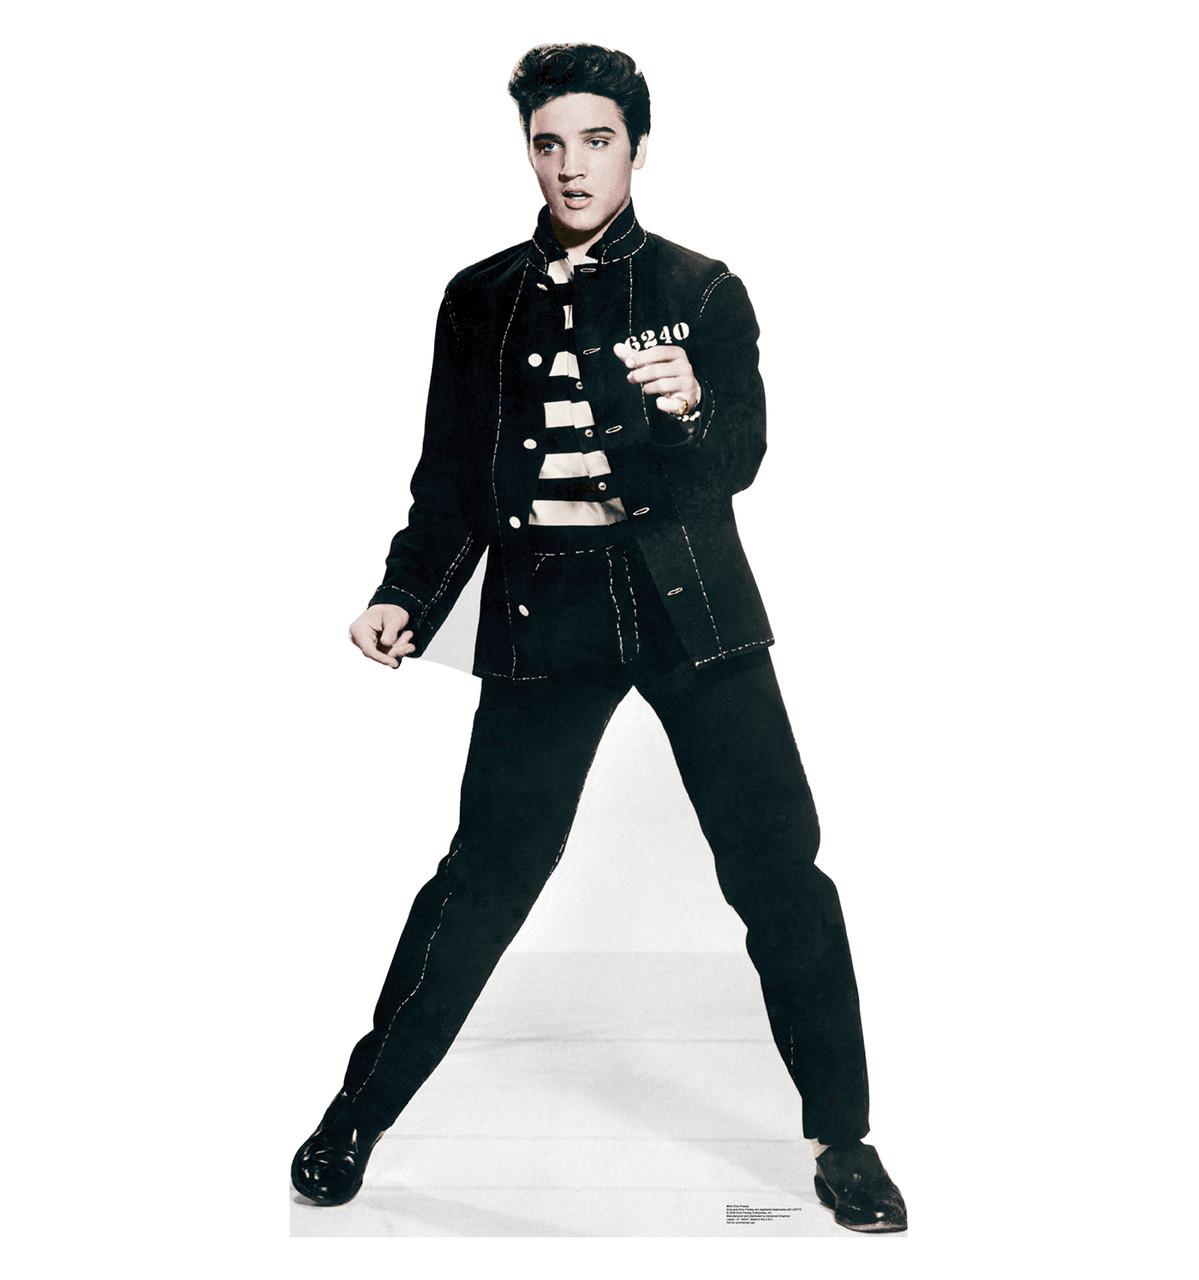 Elvis Presley Jailhouse Rock - Cardboard Cutout 840